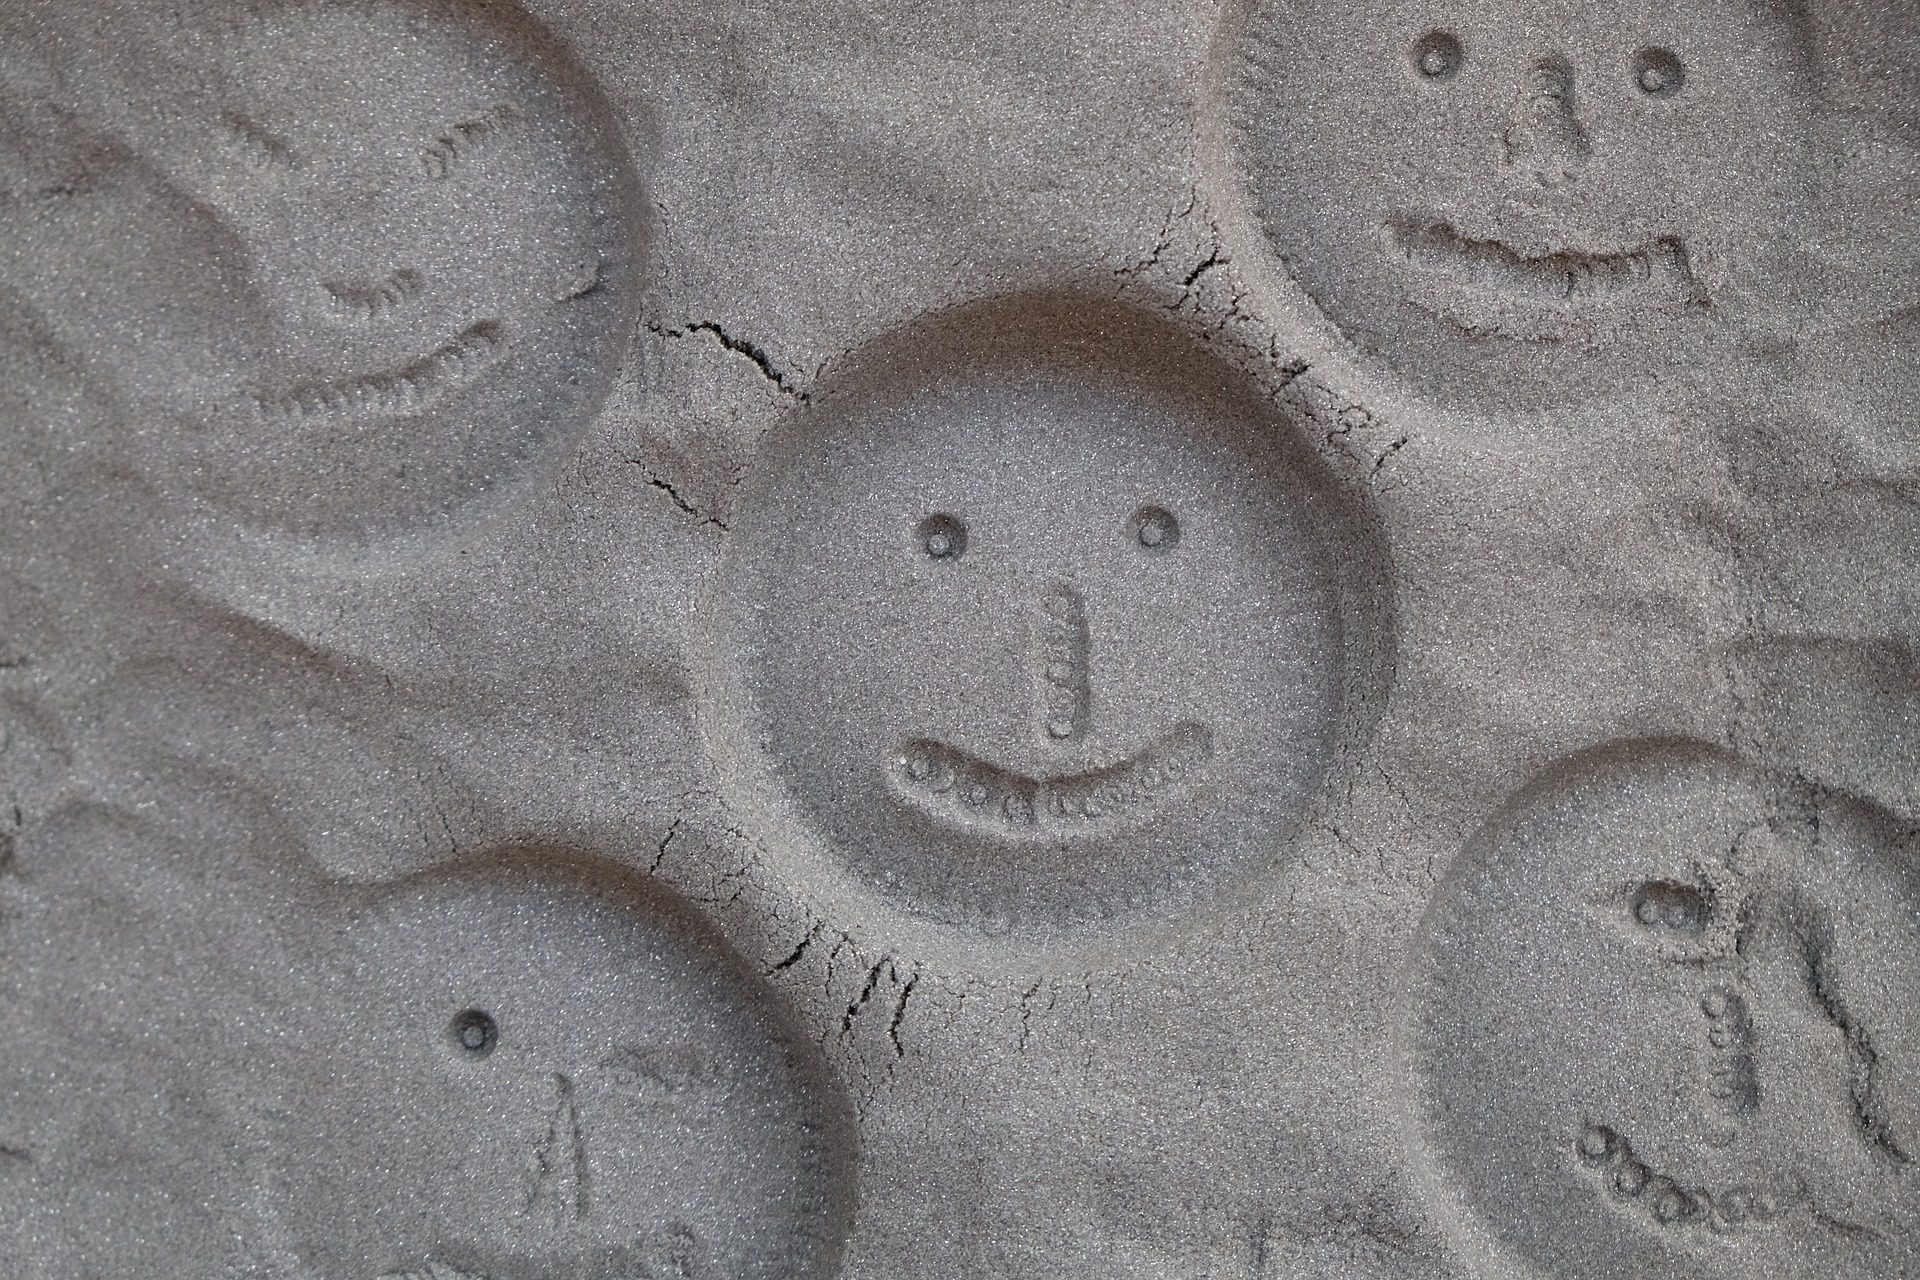 figure, sabbia, volti, sorrisi, Smiley - Sfondi HD - Professor-falken.com